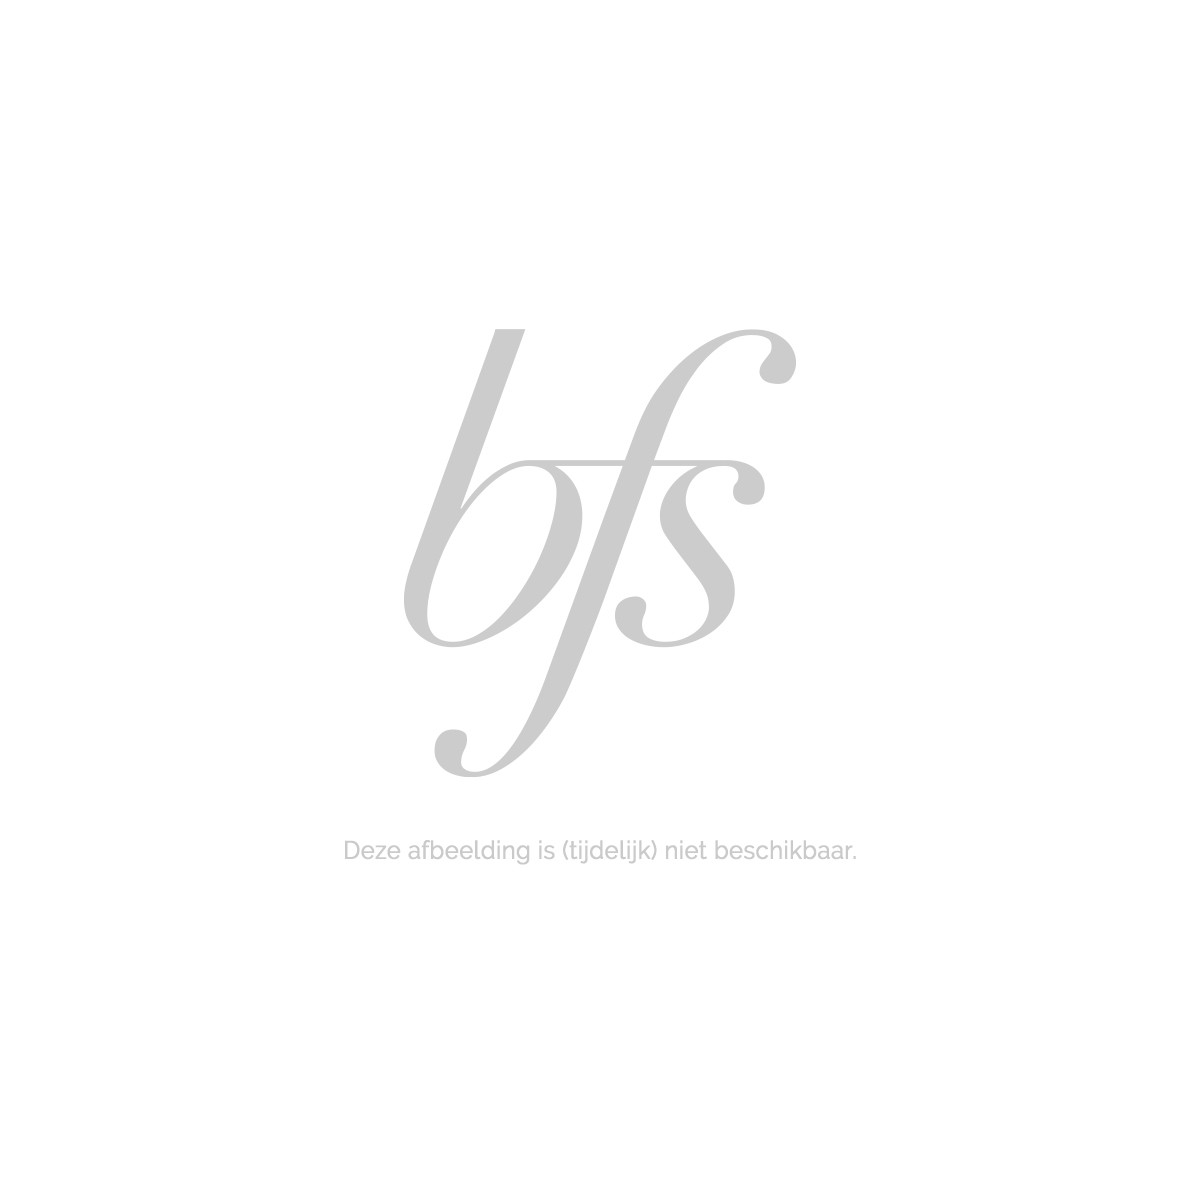 Ibp Stiletto Tips Medium Natural 500Pcs